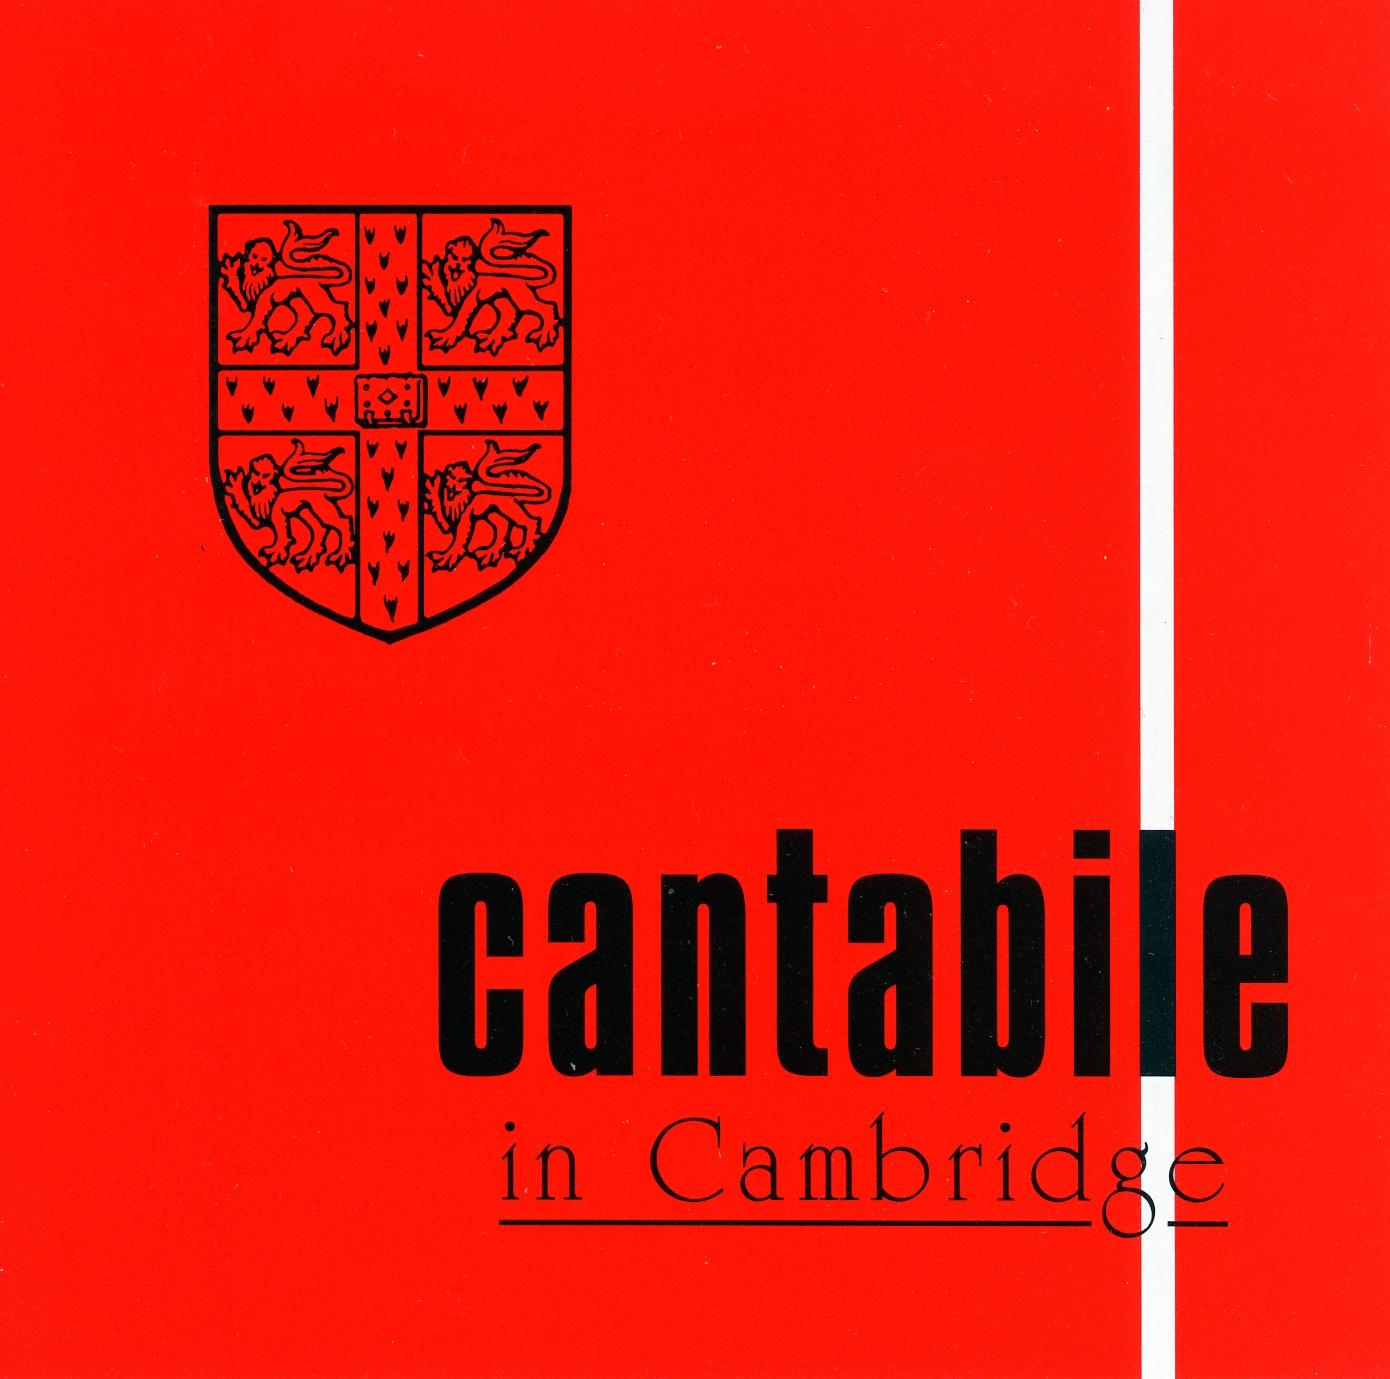 Cantabile in Cambridge